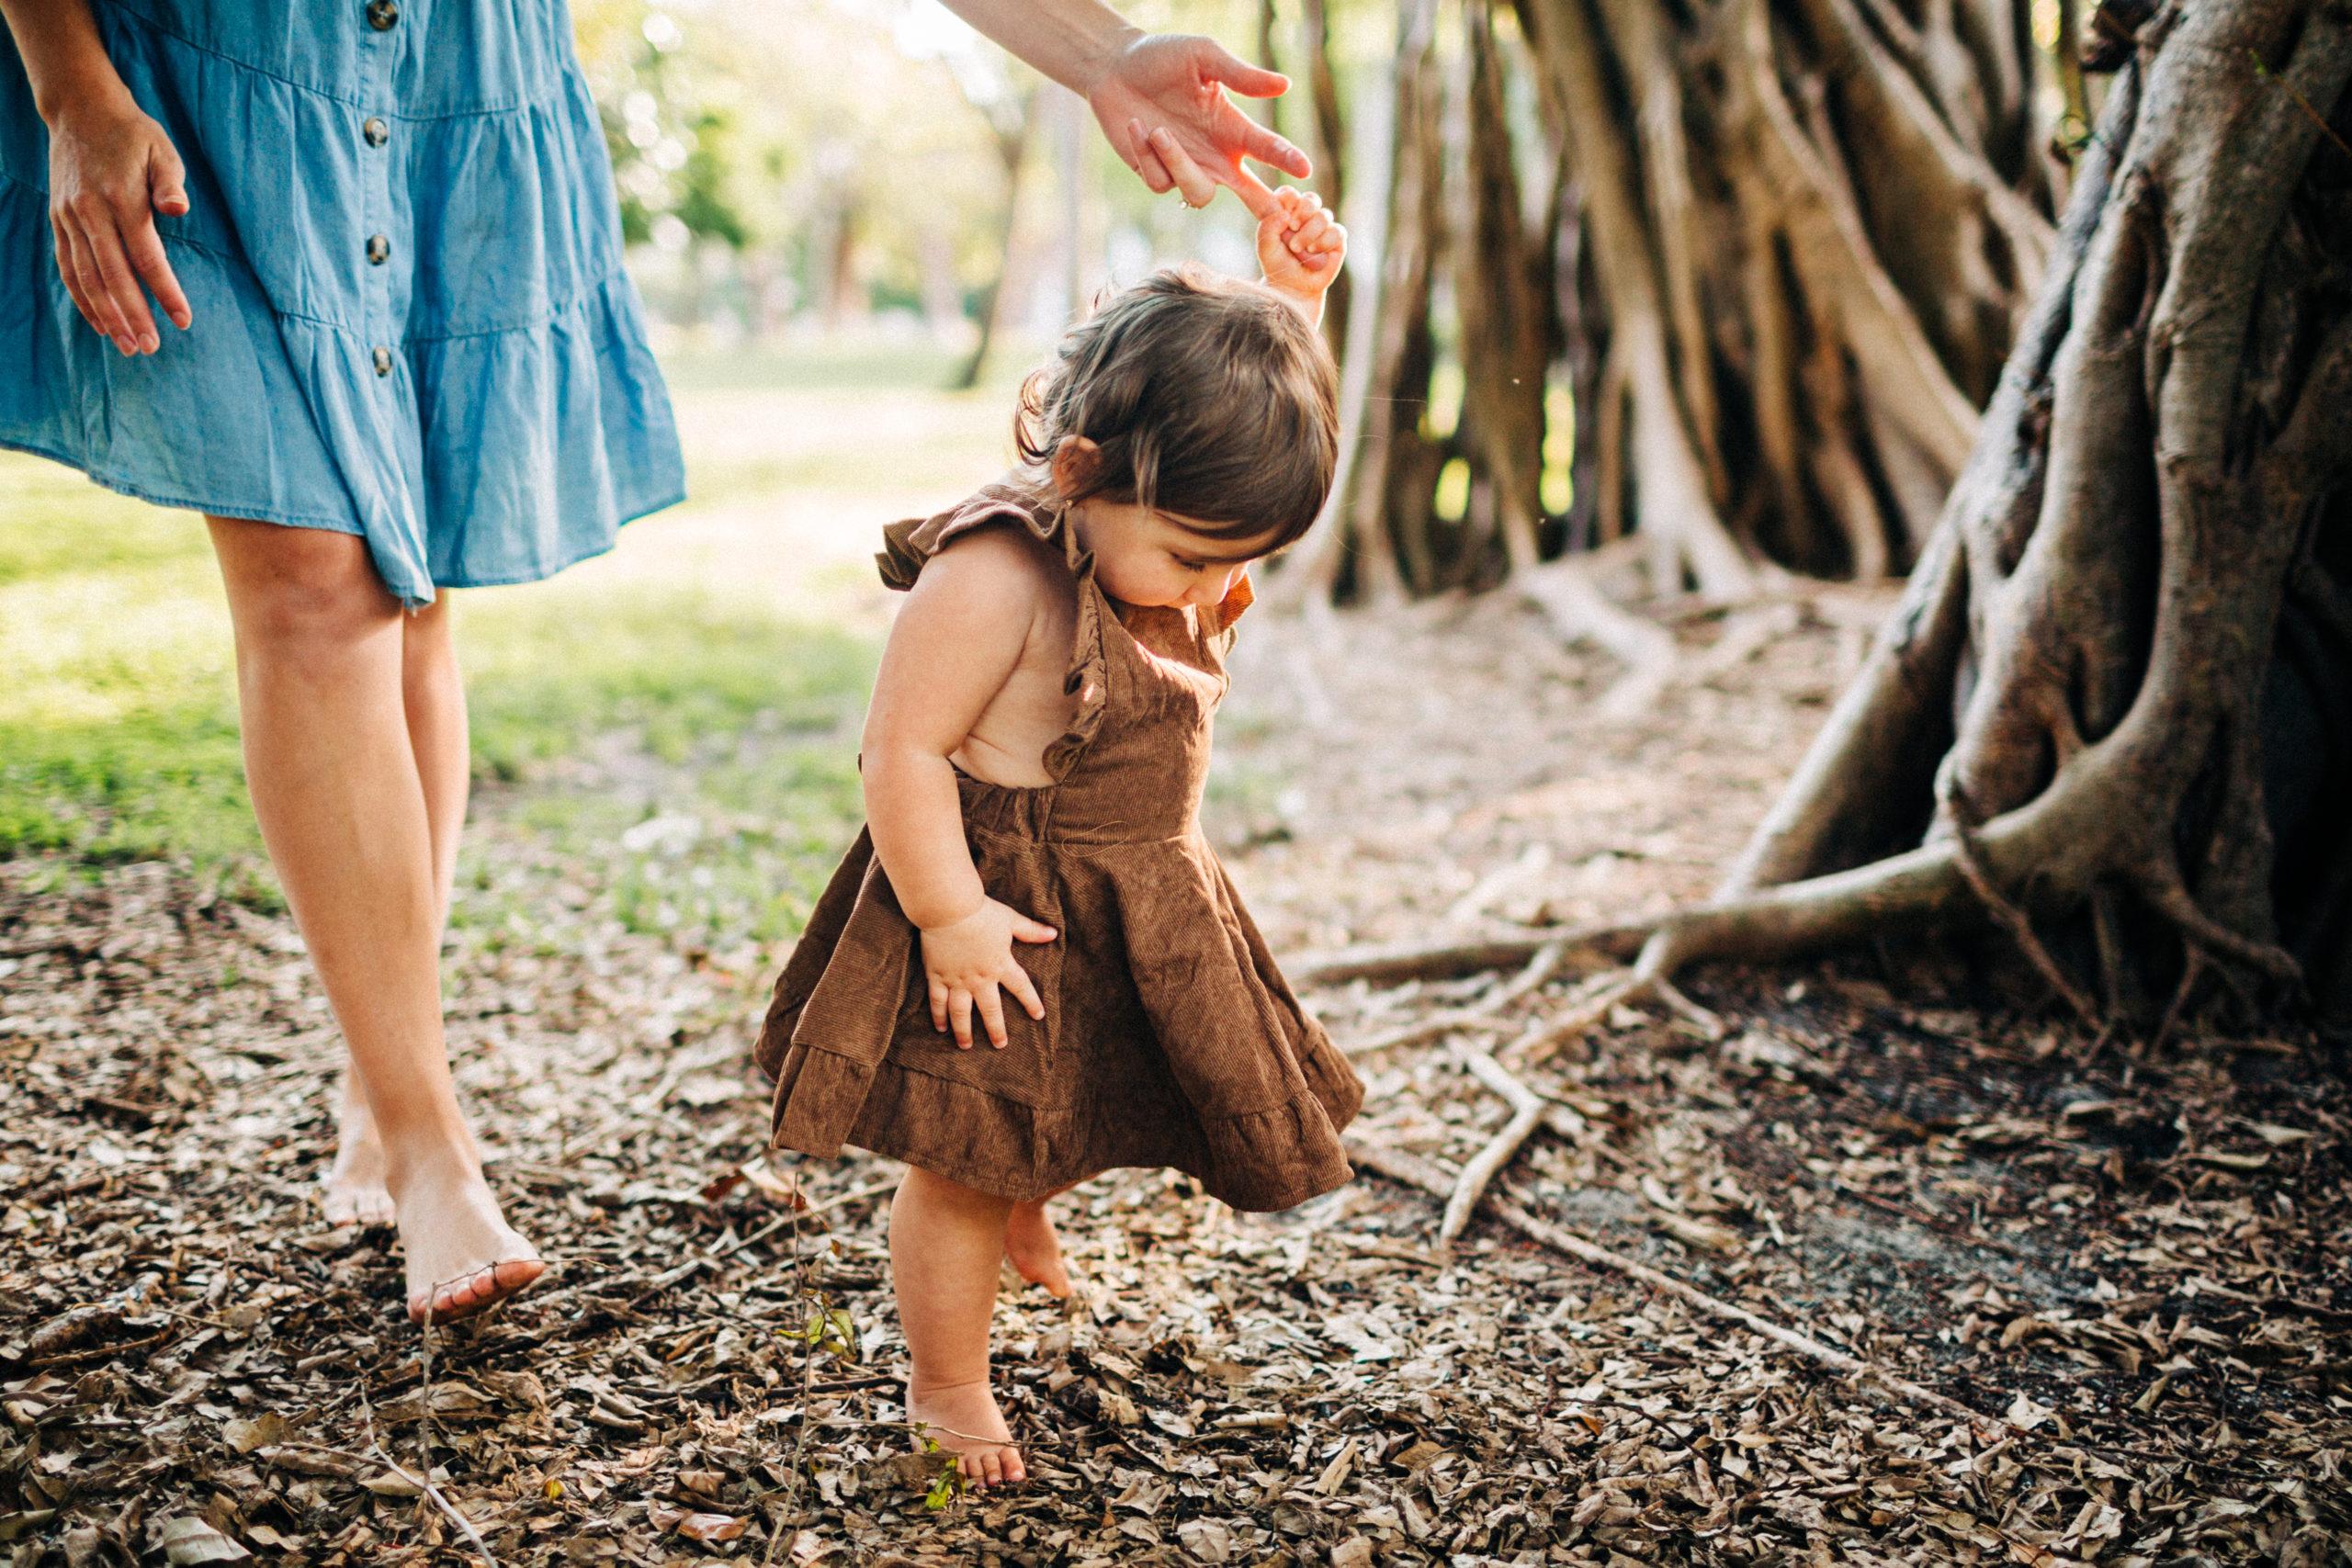 MotherhoodSession_Miami-2-scaled Miami's 8 best Photoshoot Locations